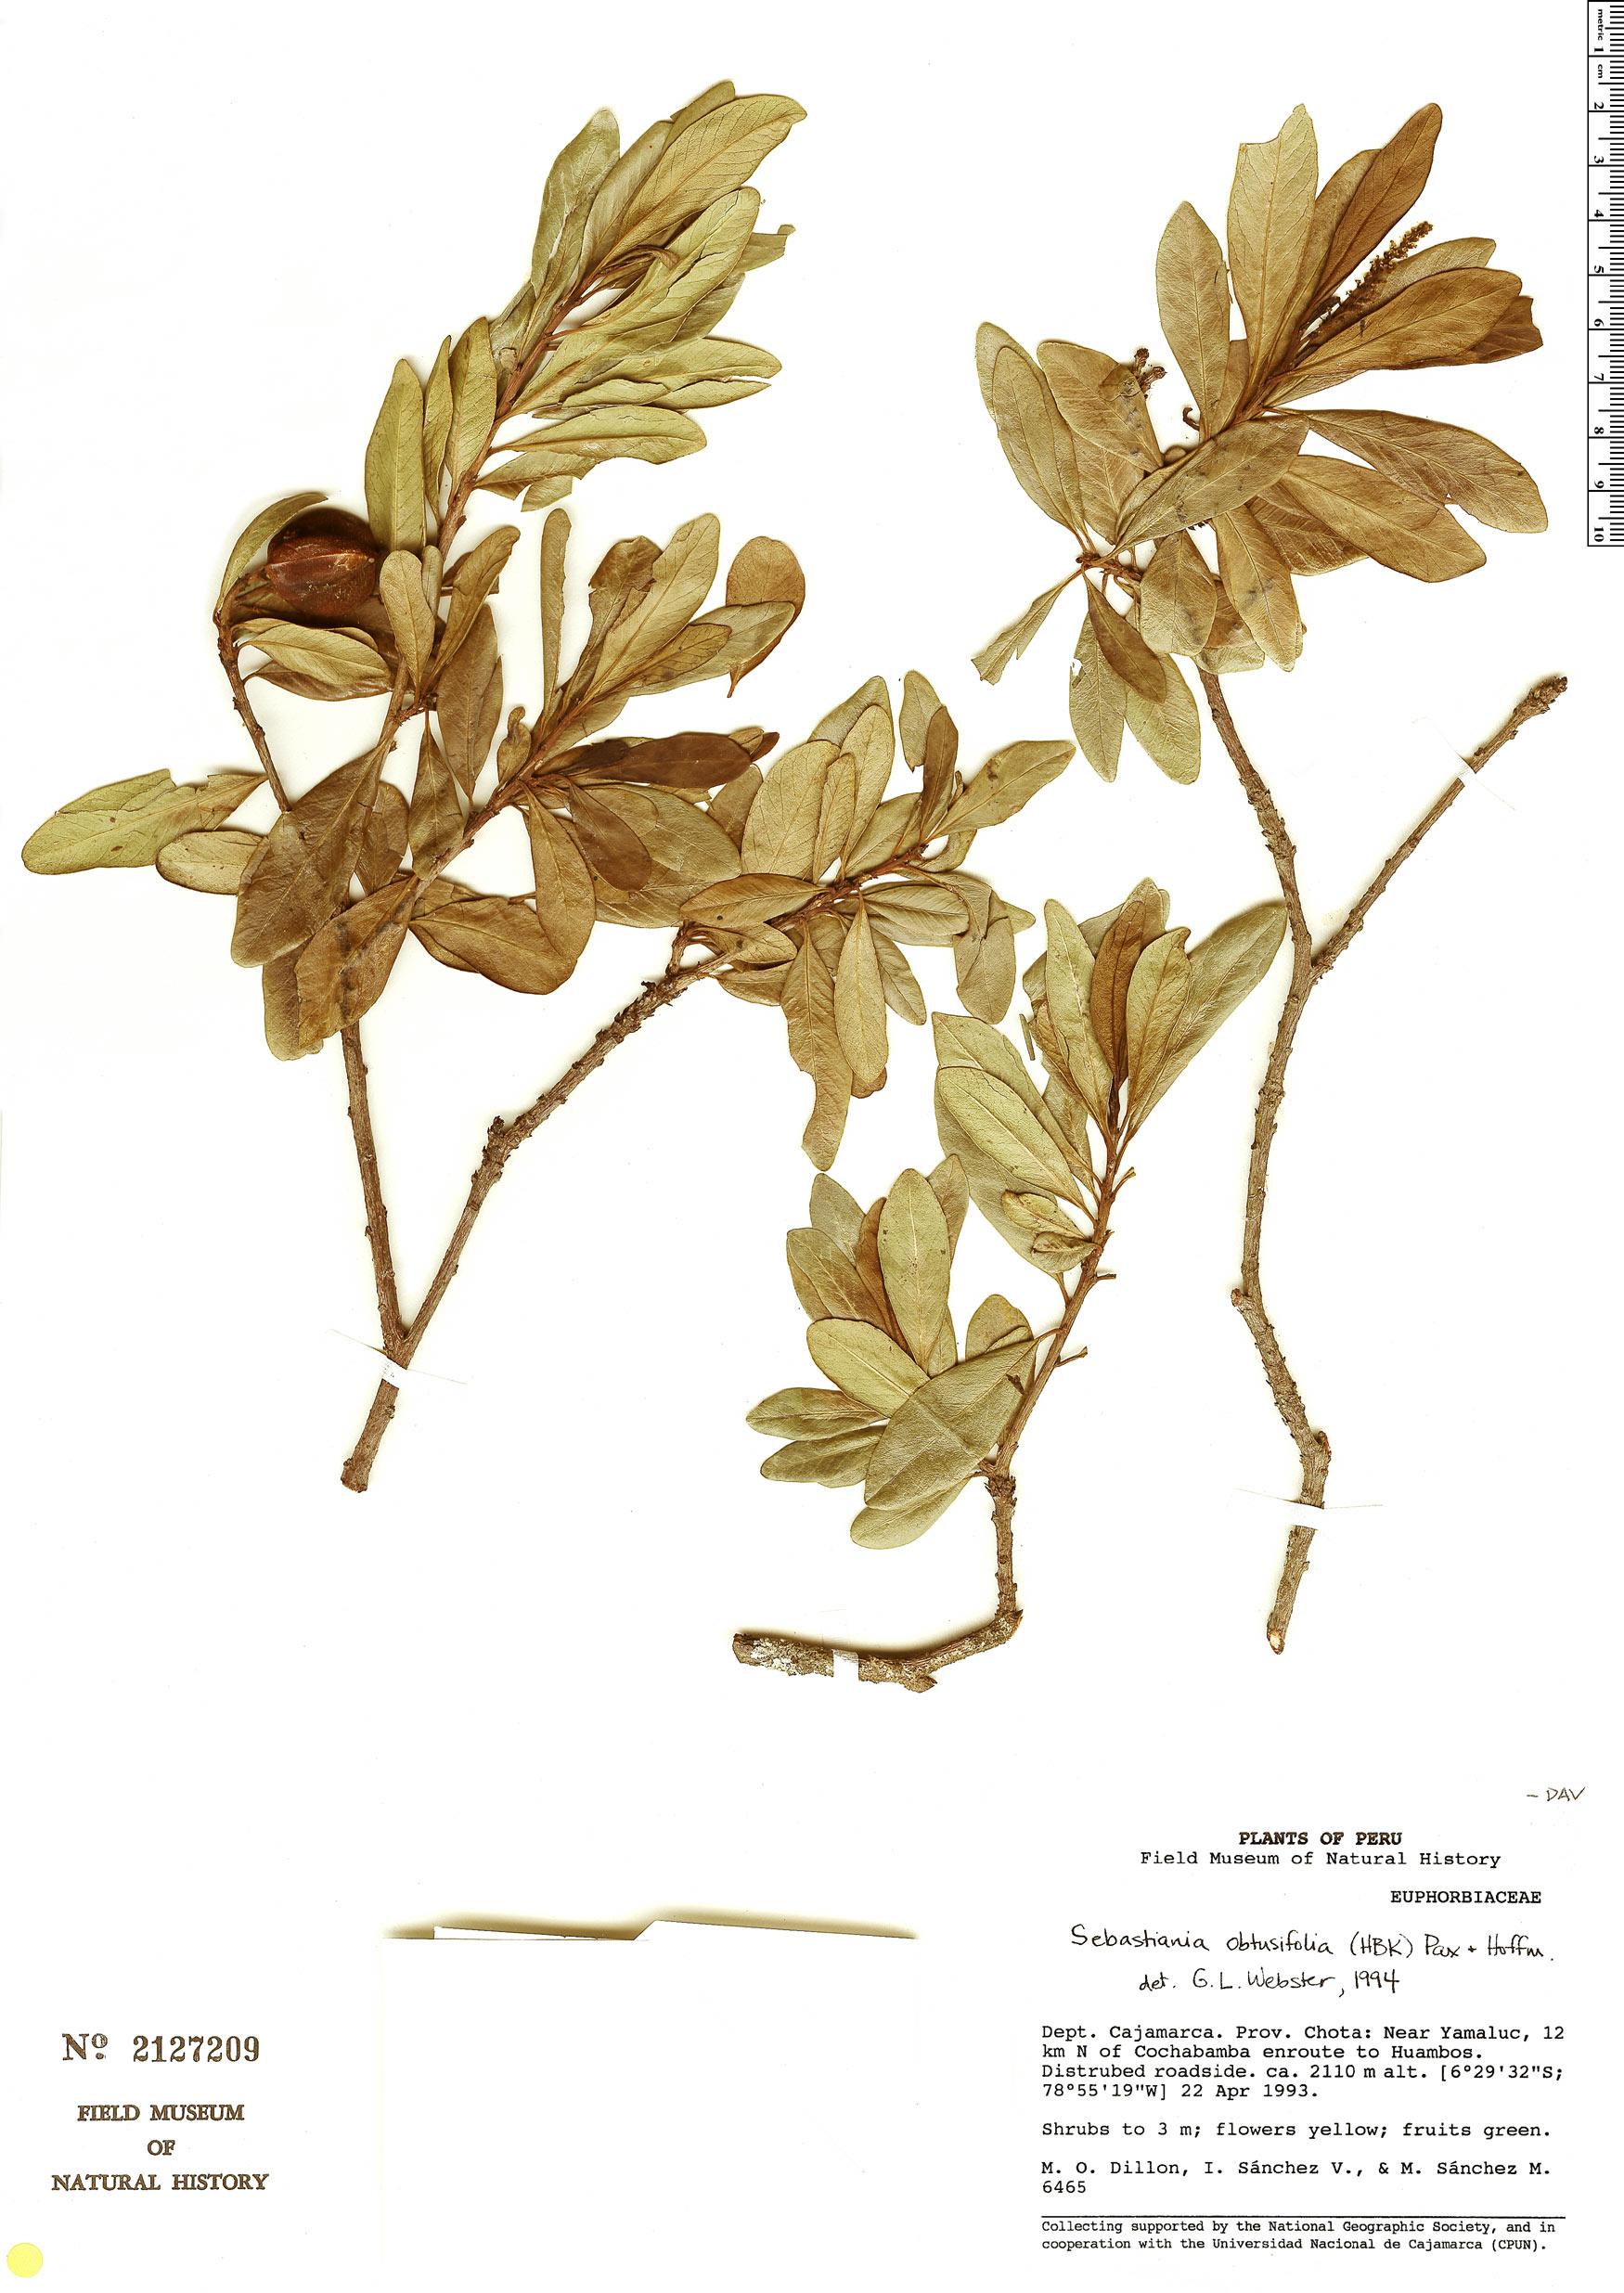 Specimen: Sebastiania obtusifolia